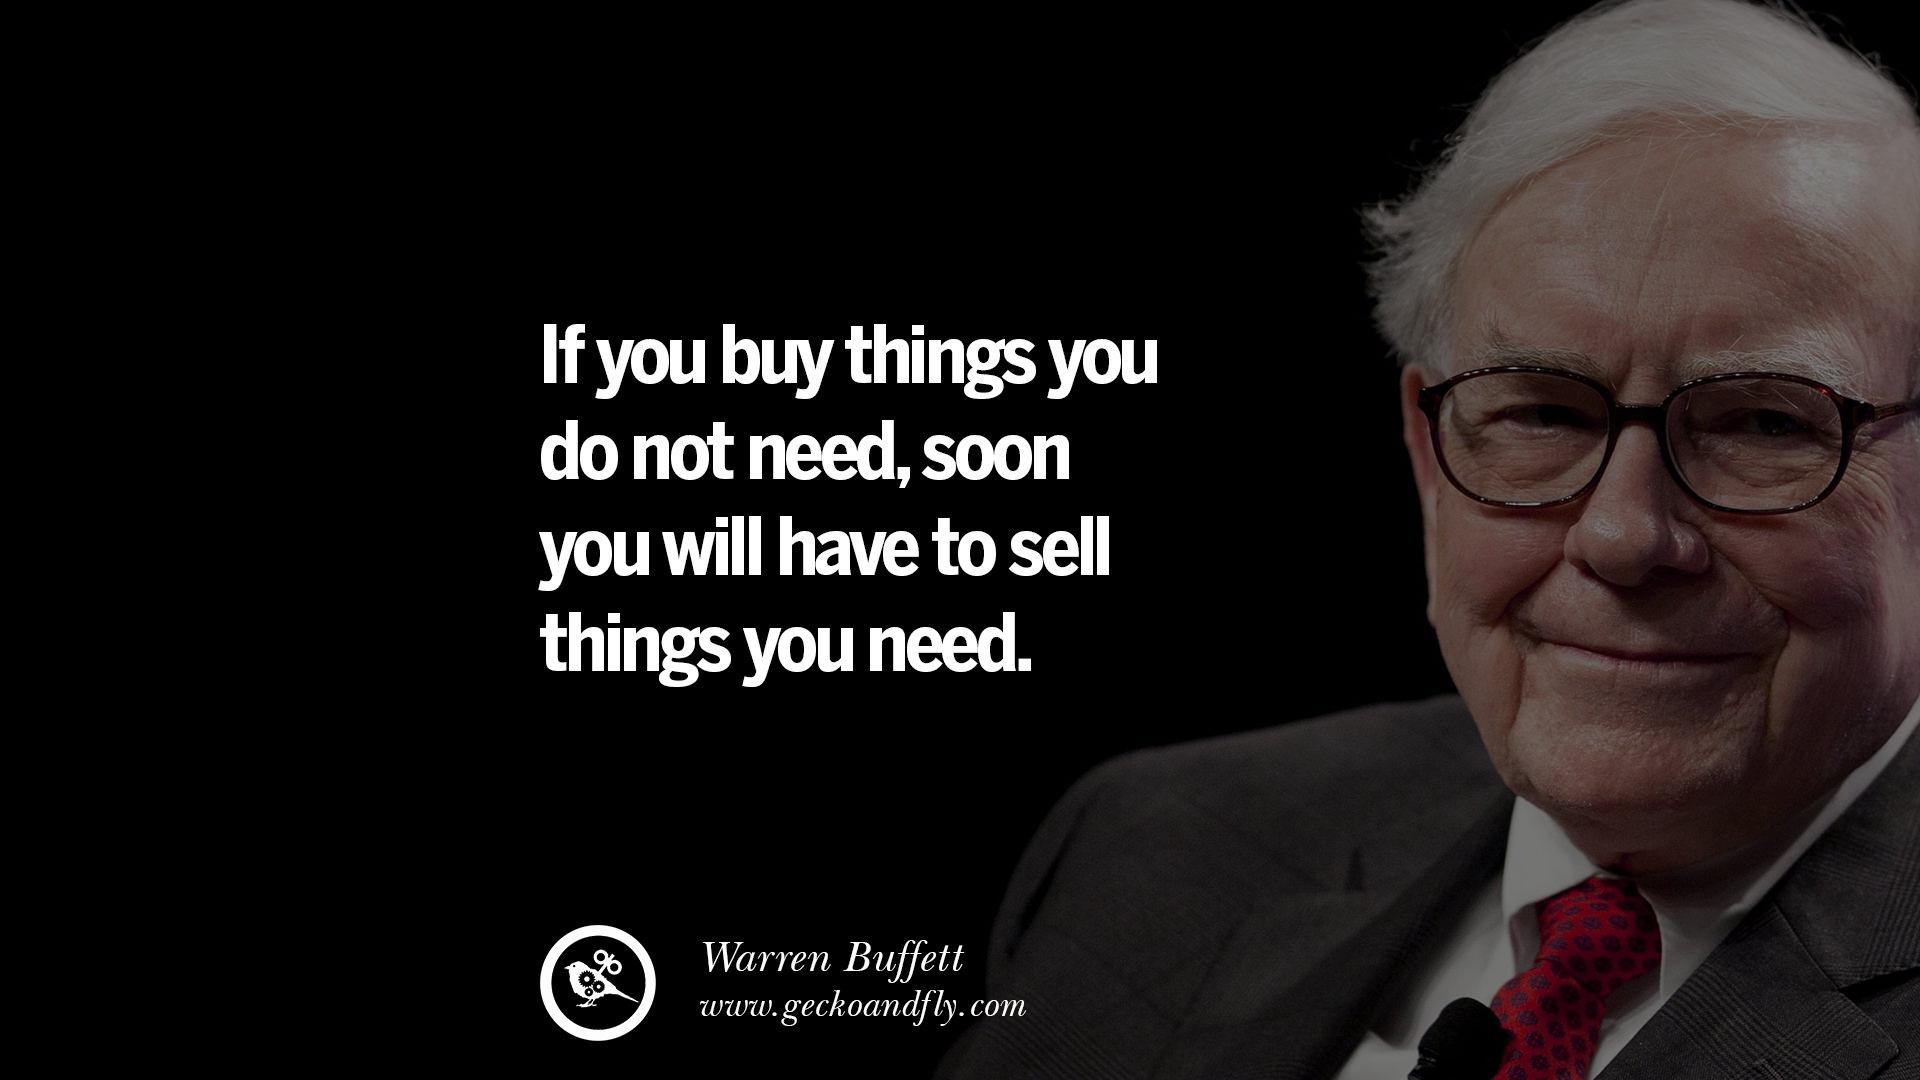 Enjoyable 18 Investment Advises By Warren Buffett On Wealth Management Home Interior And Landscaping Ferensignezvosmurscom